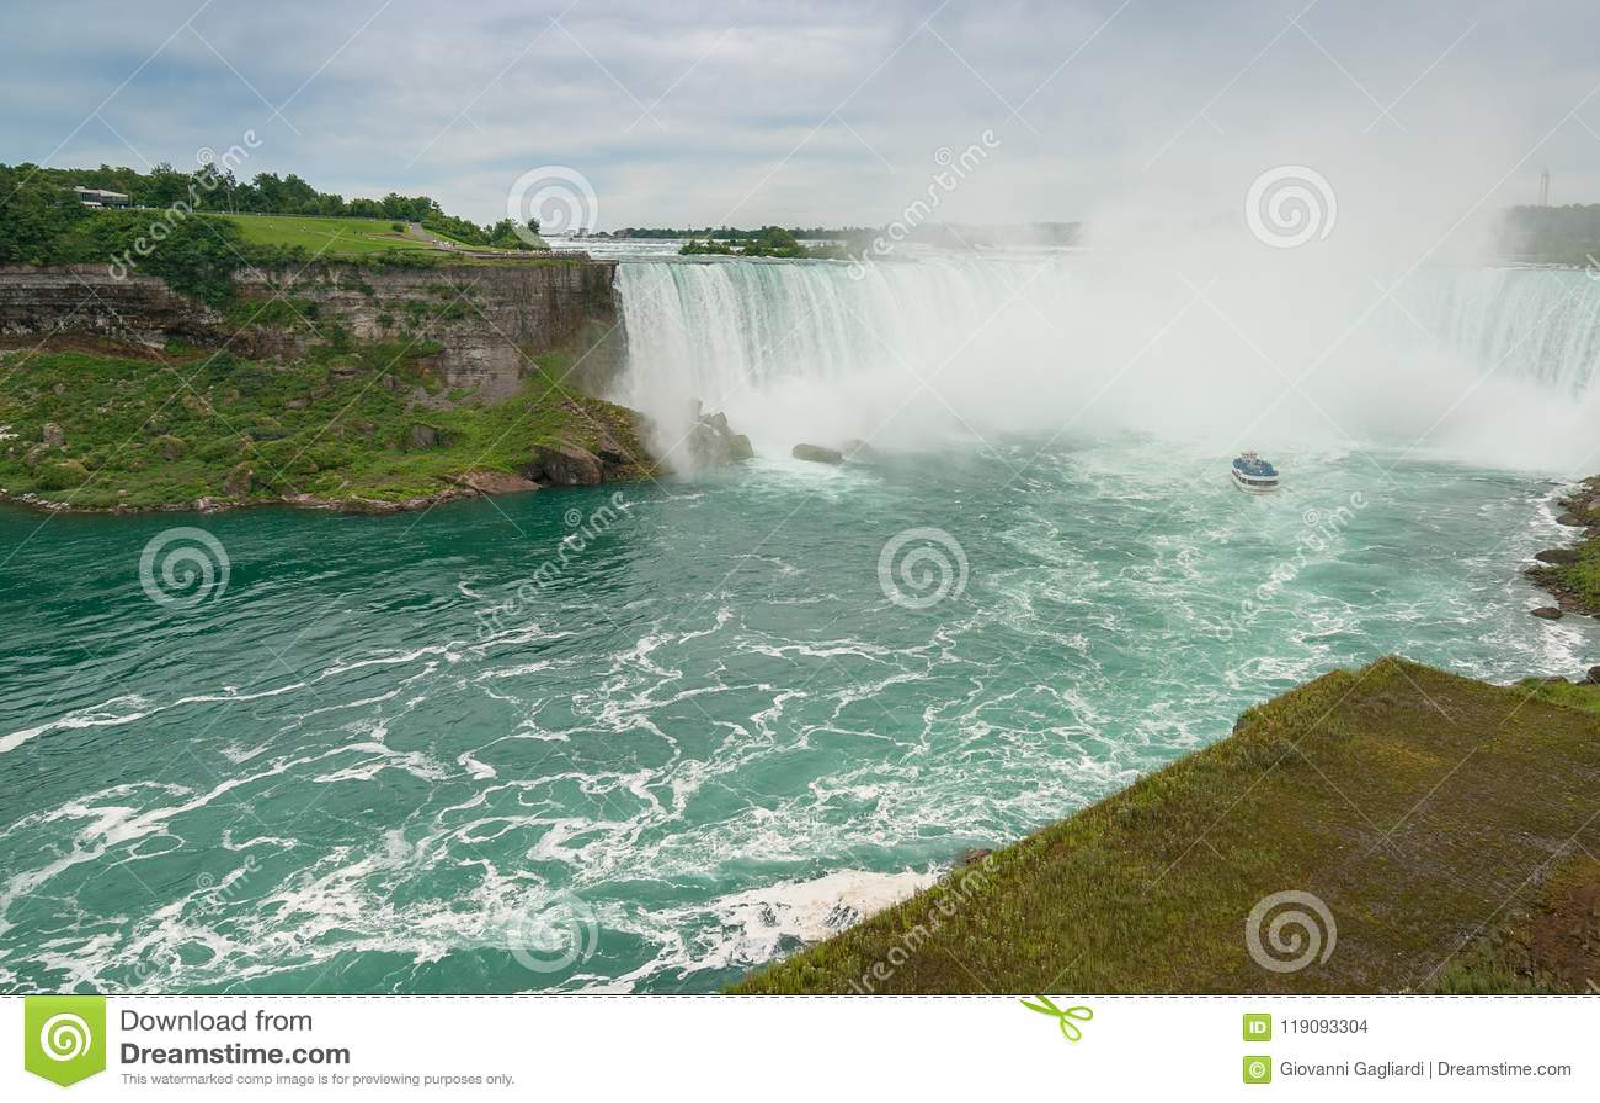 Magnificência de Niagara Falls, Canadá